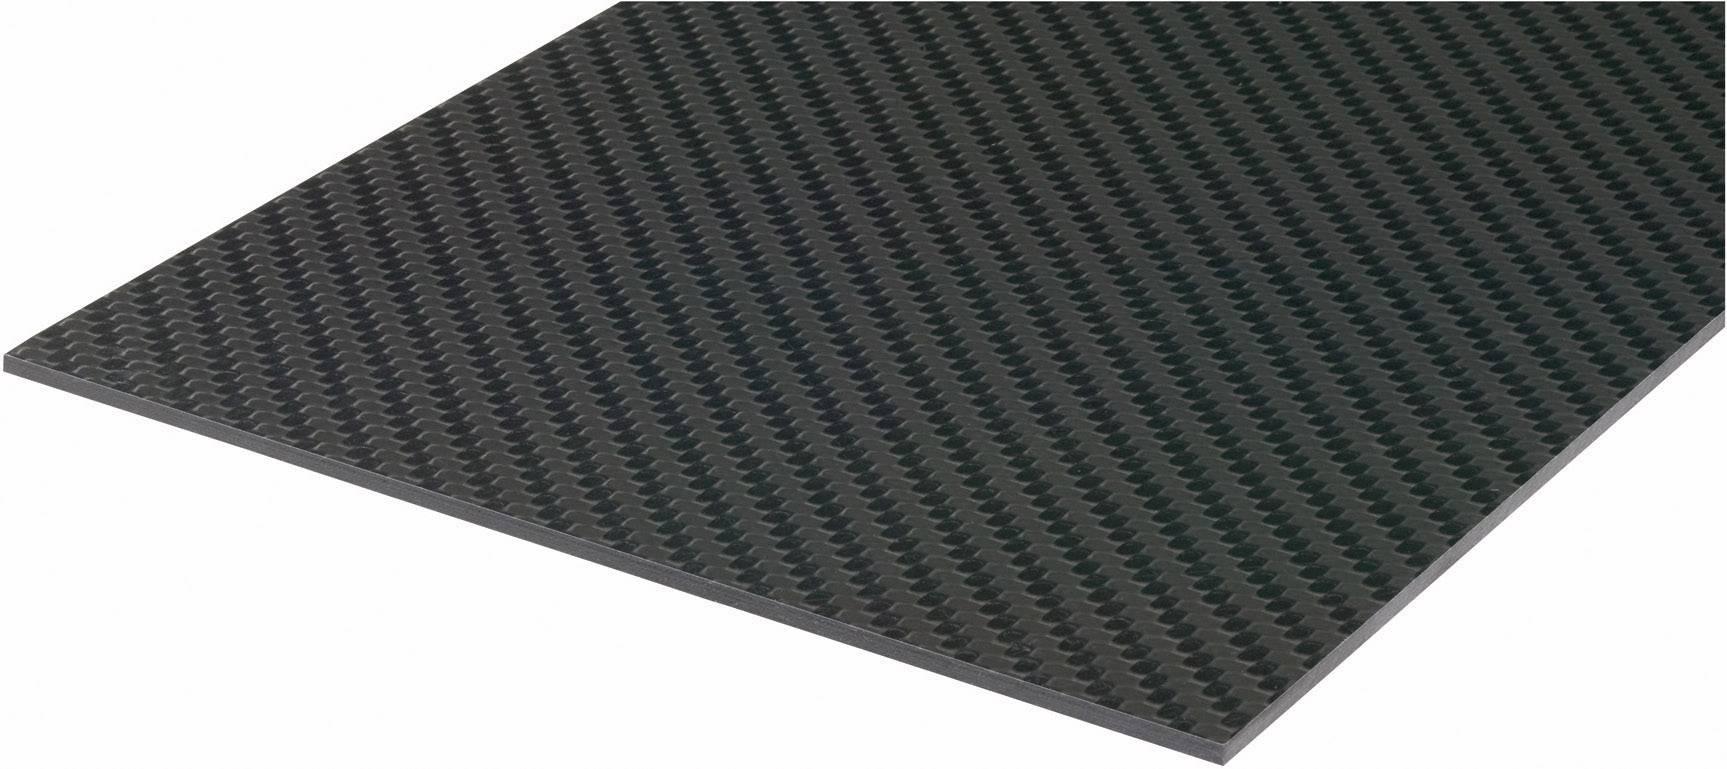 Uhlíková prepreg deska Carbotec 229916, (d x š) 340 mm x 150 mm x 1.5 mm